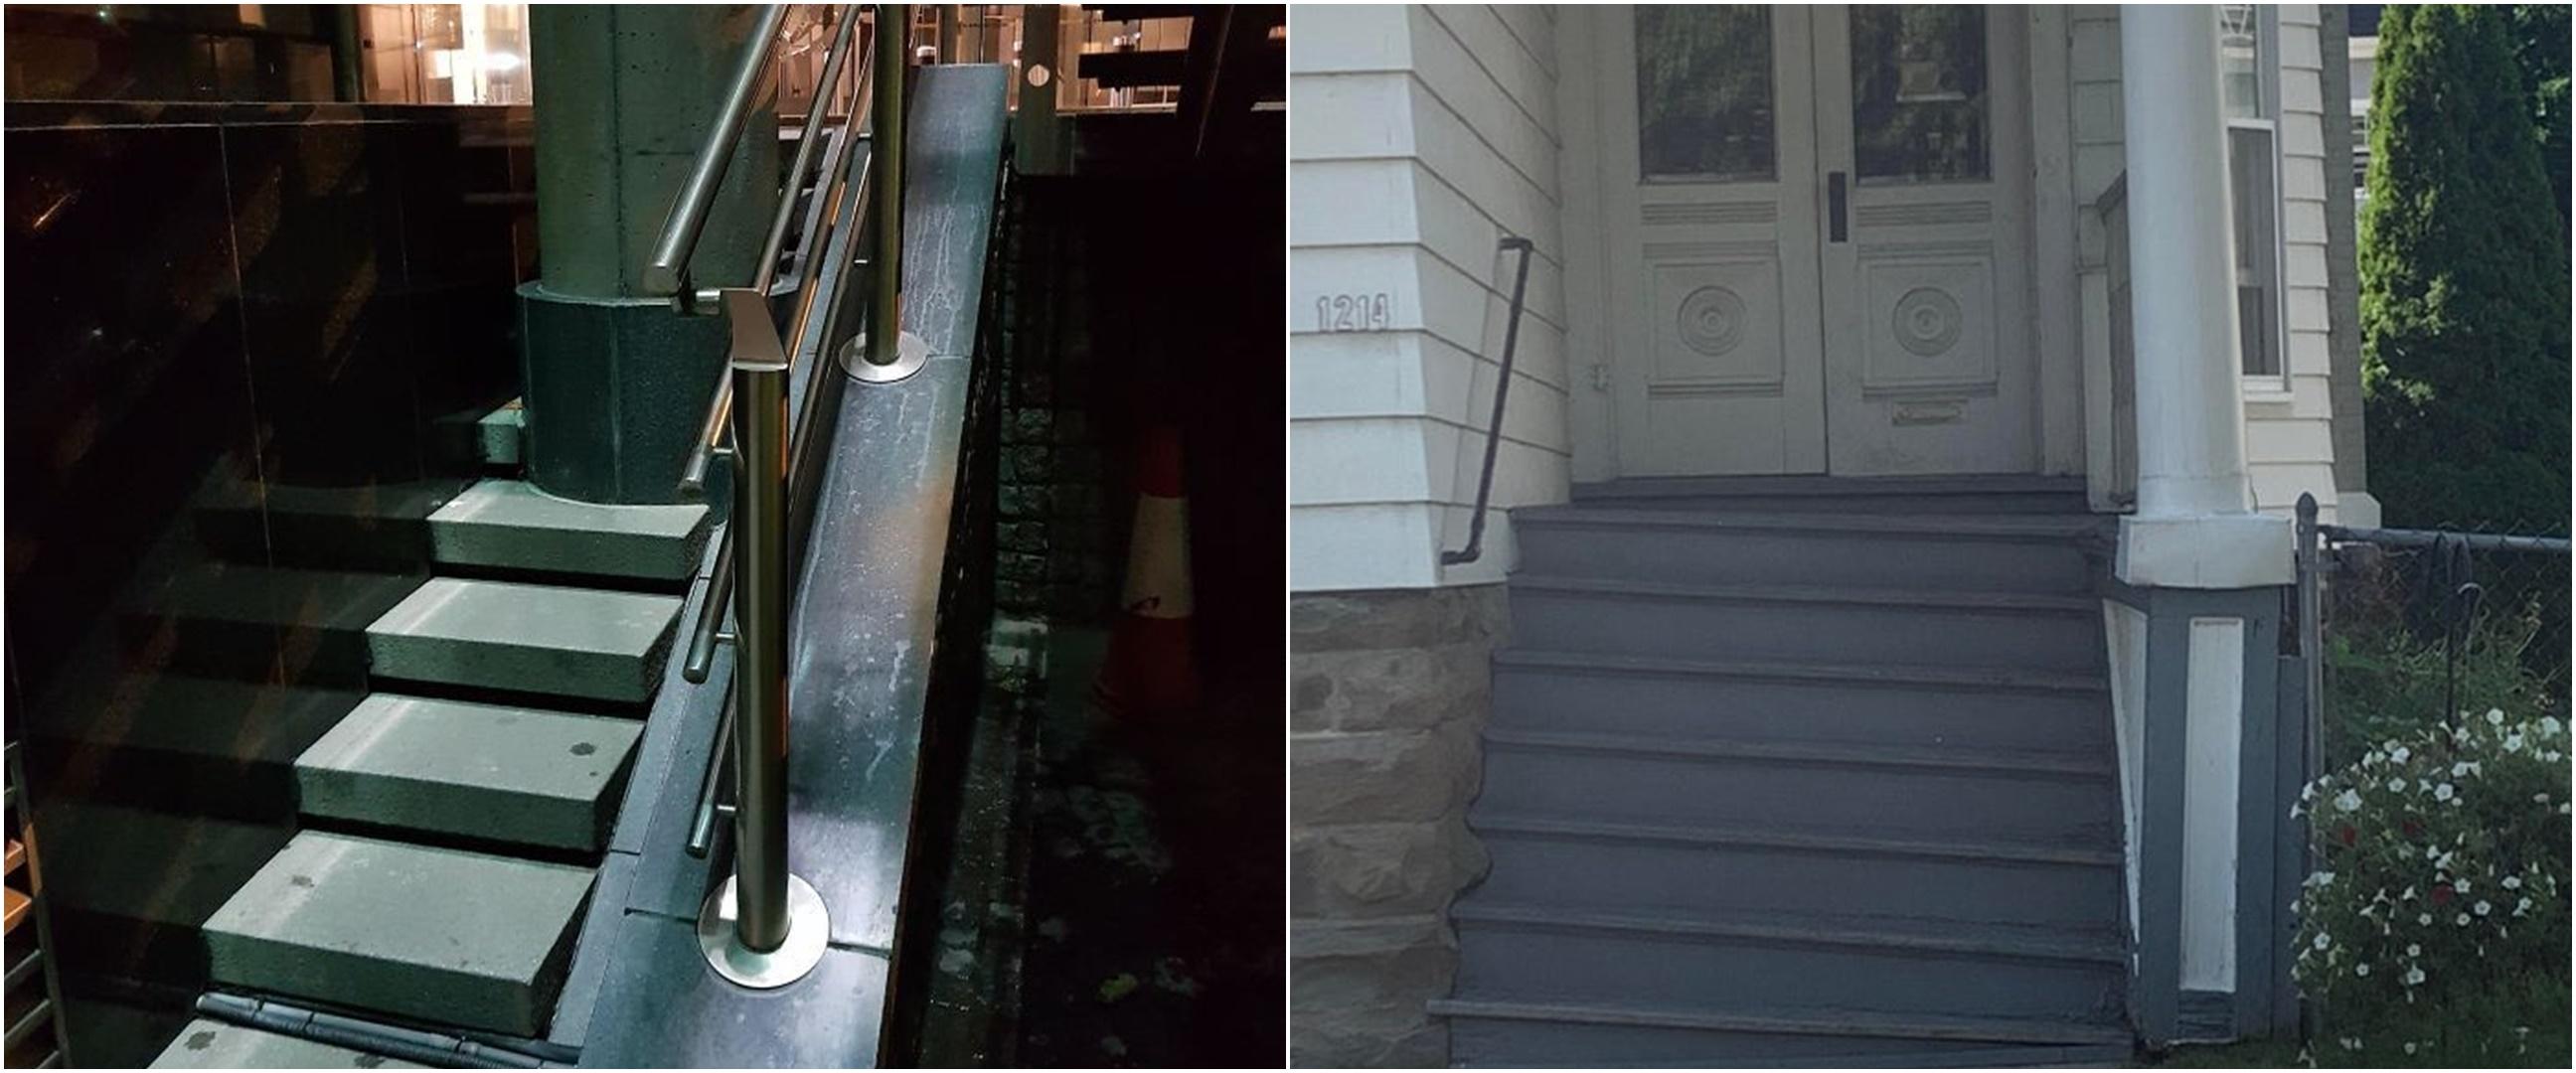 14 Desain tangga ini absurdnya bikin mikir keras